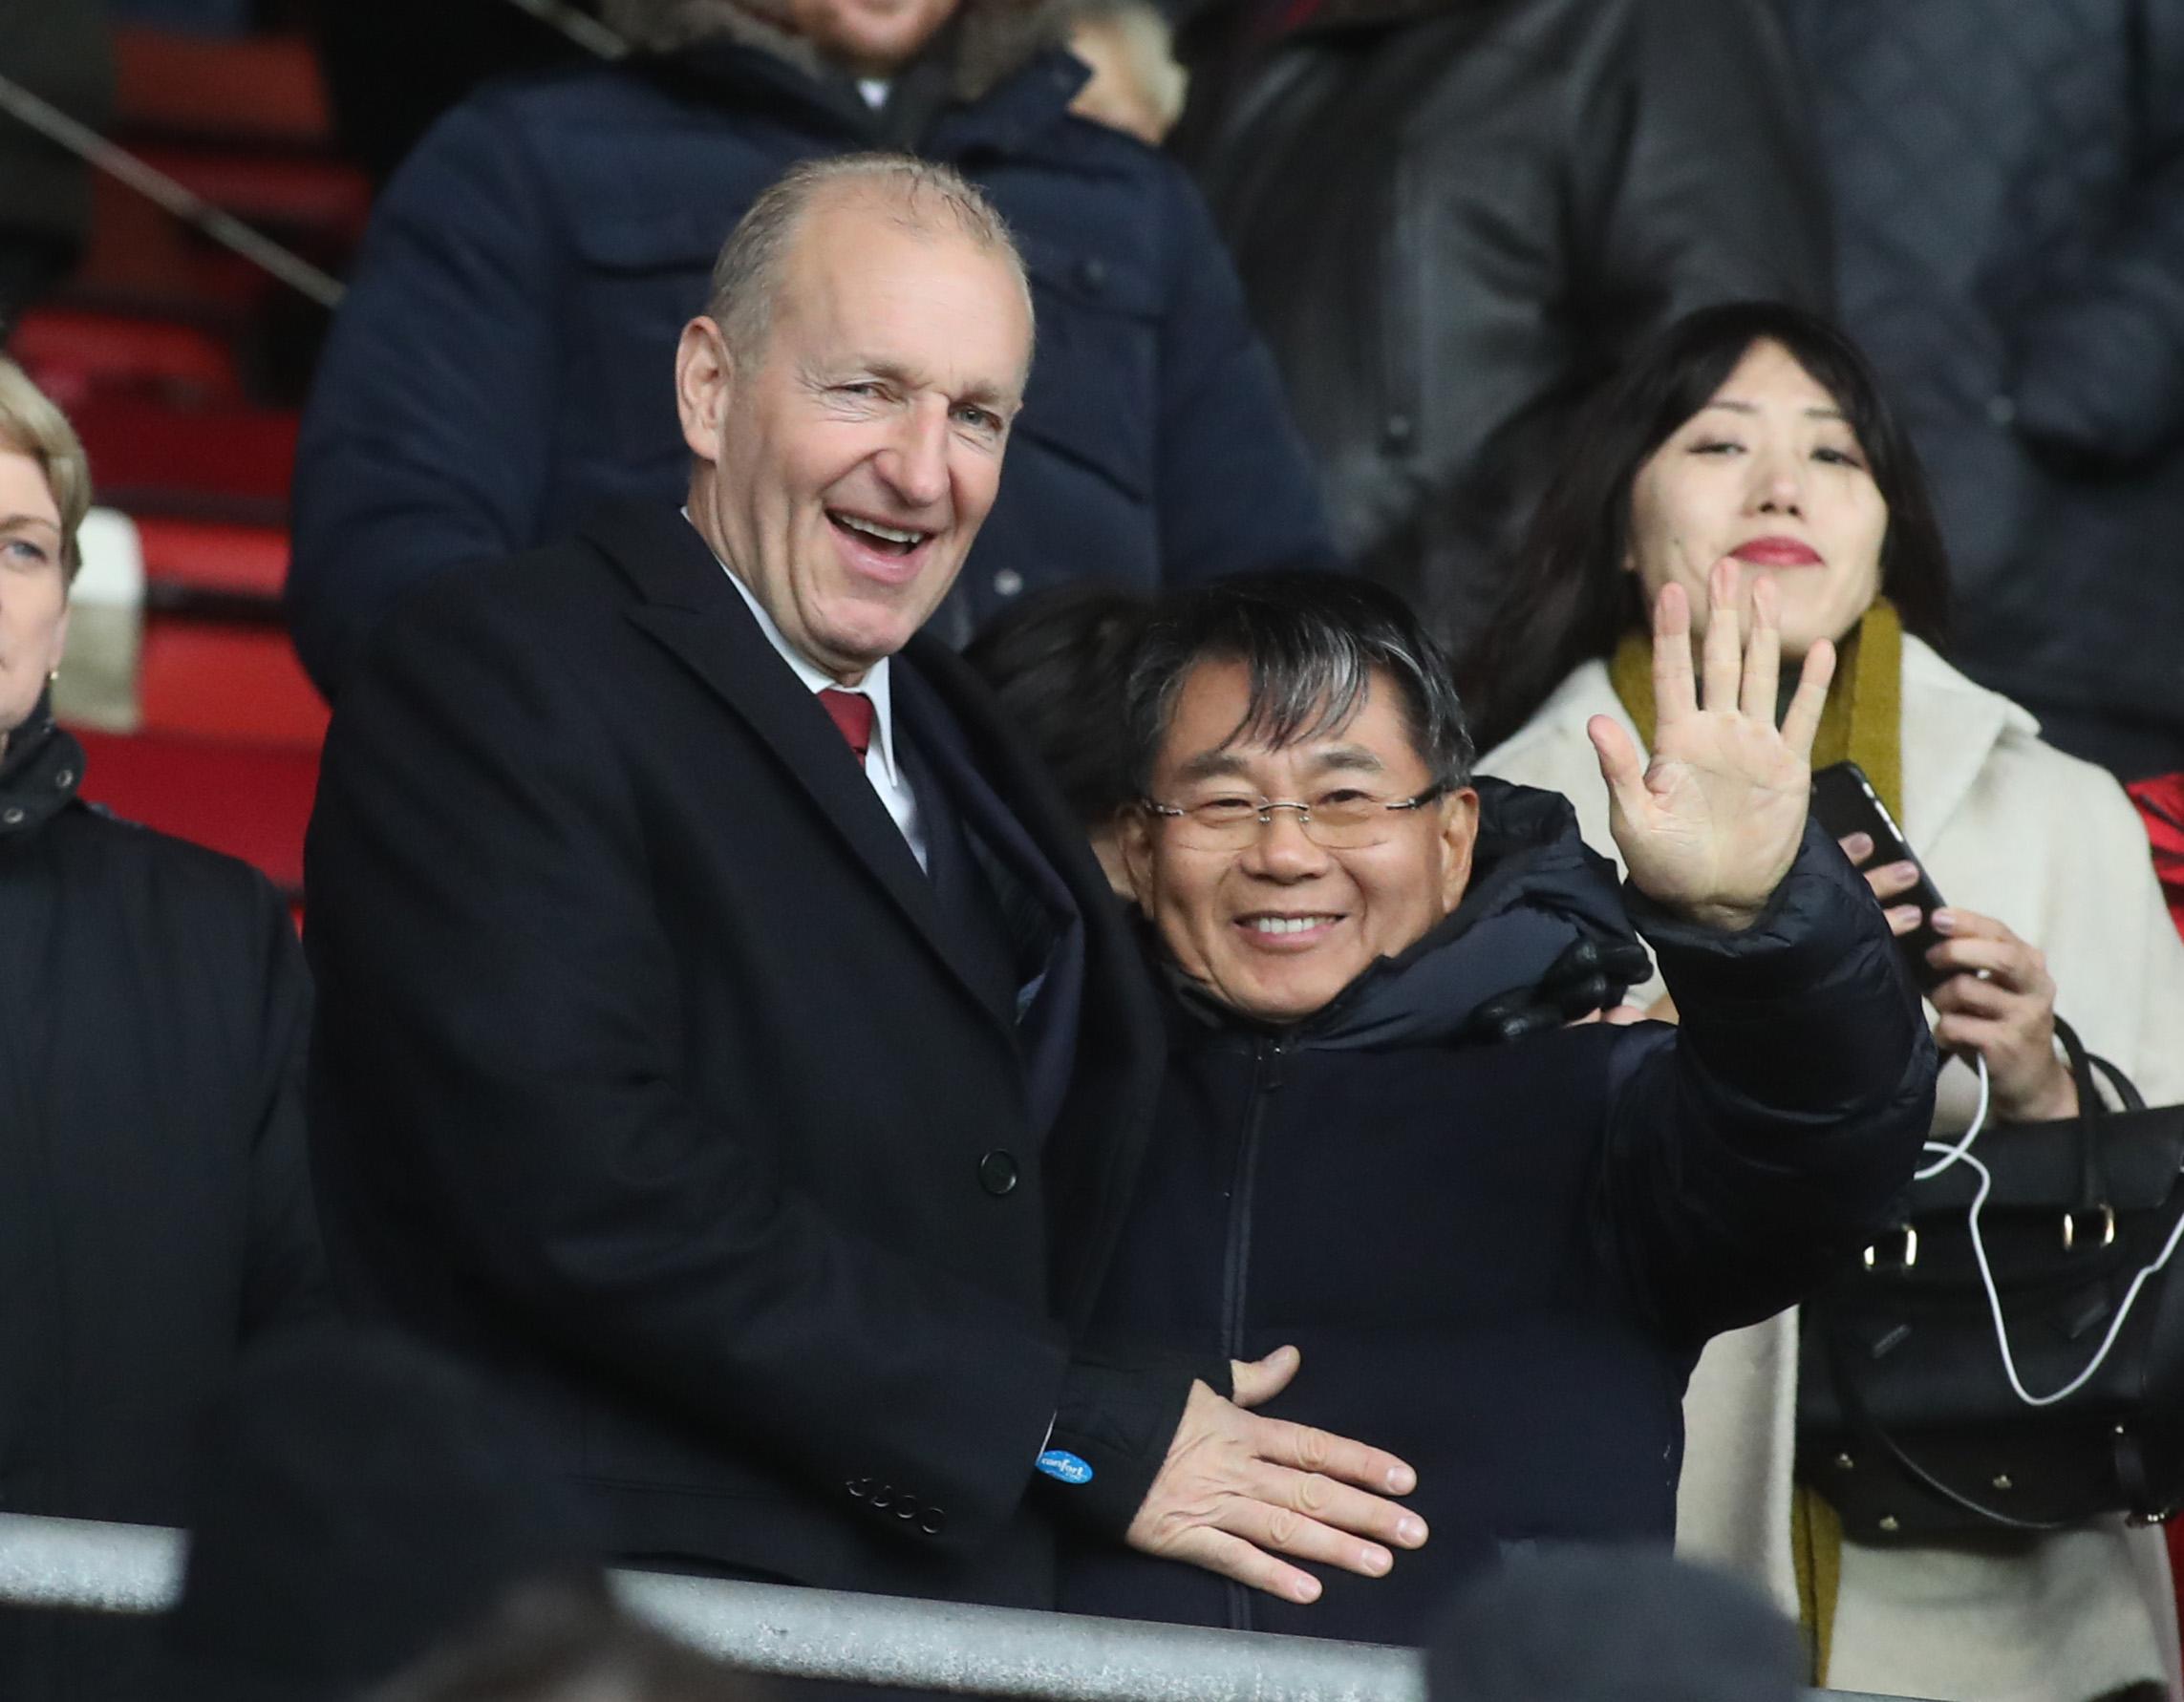 Saints owner Gao Jisheng loses controlling interest in Lander Sports